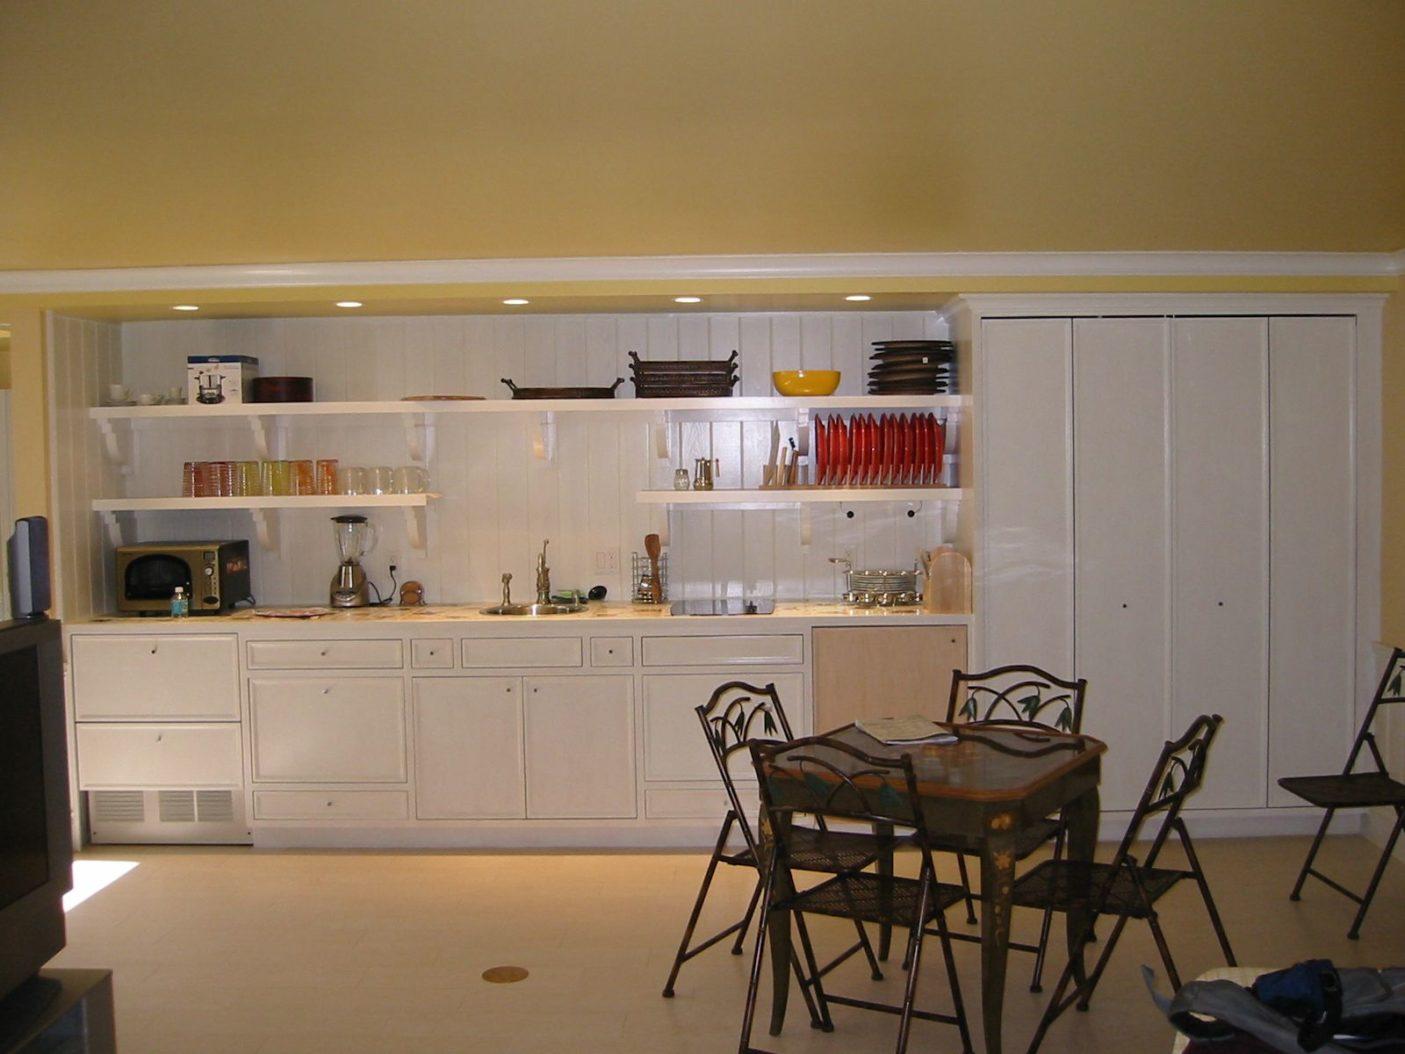 Kitchens-170.jpg